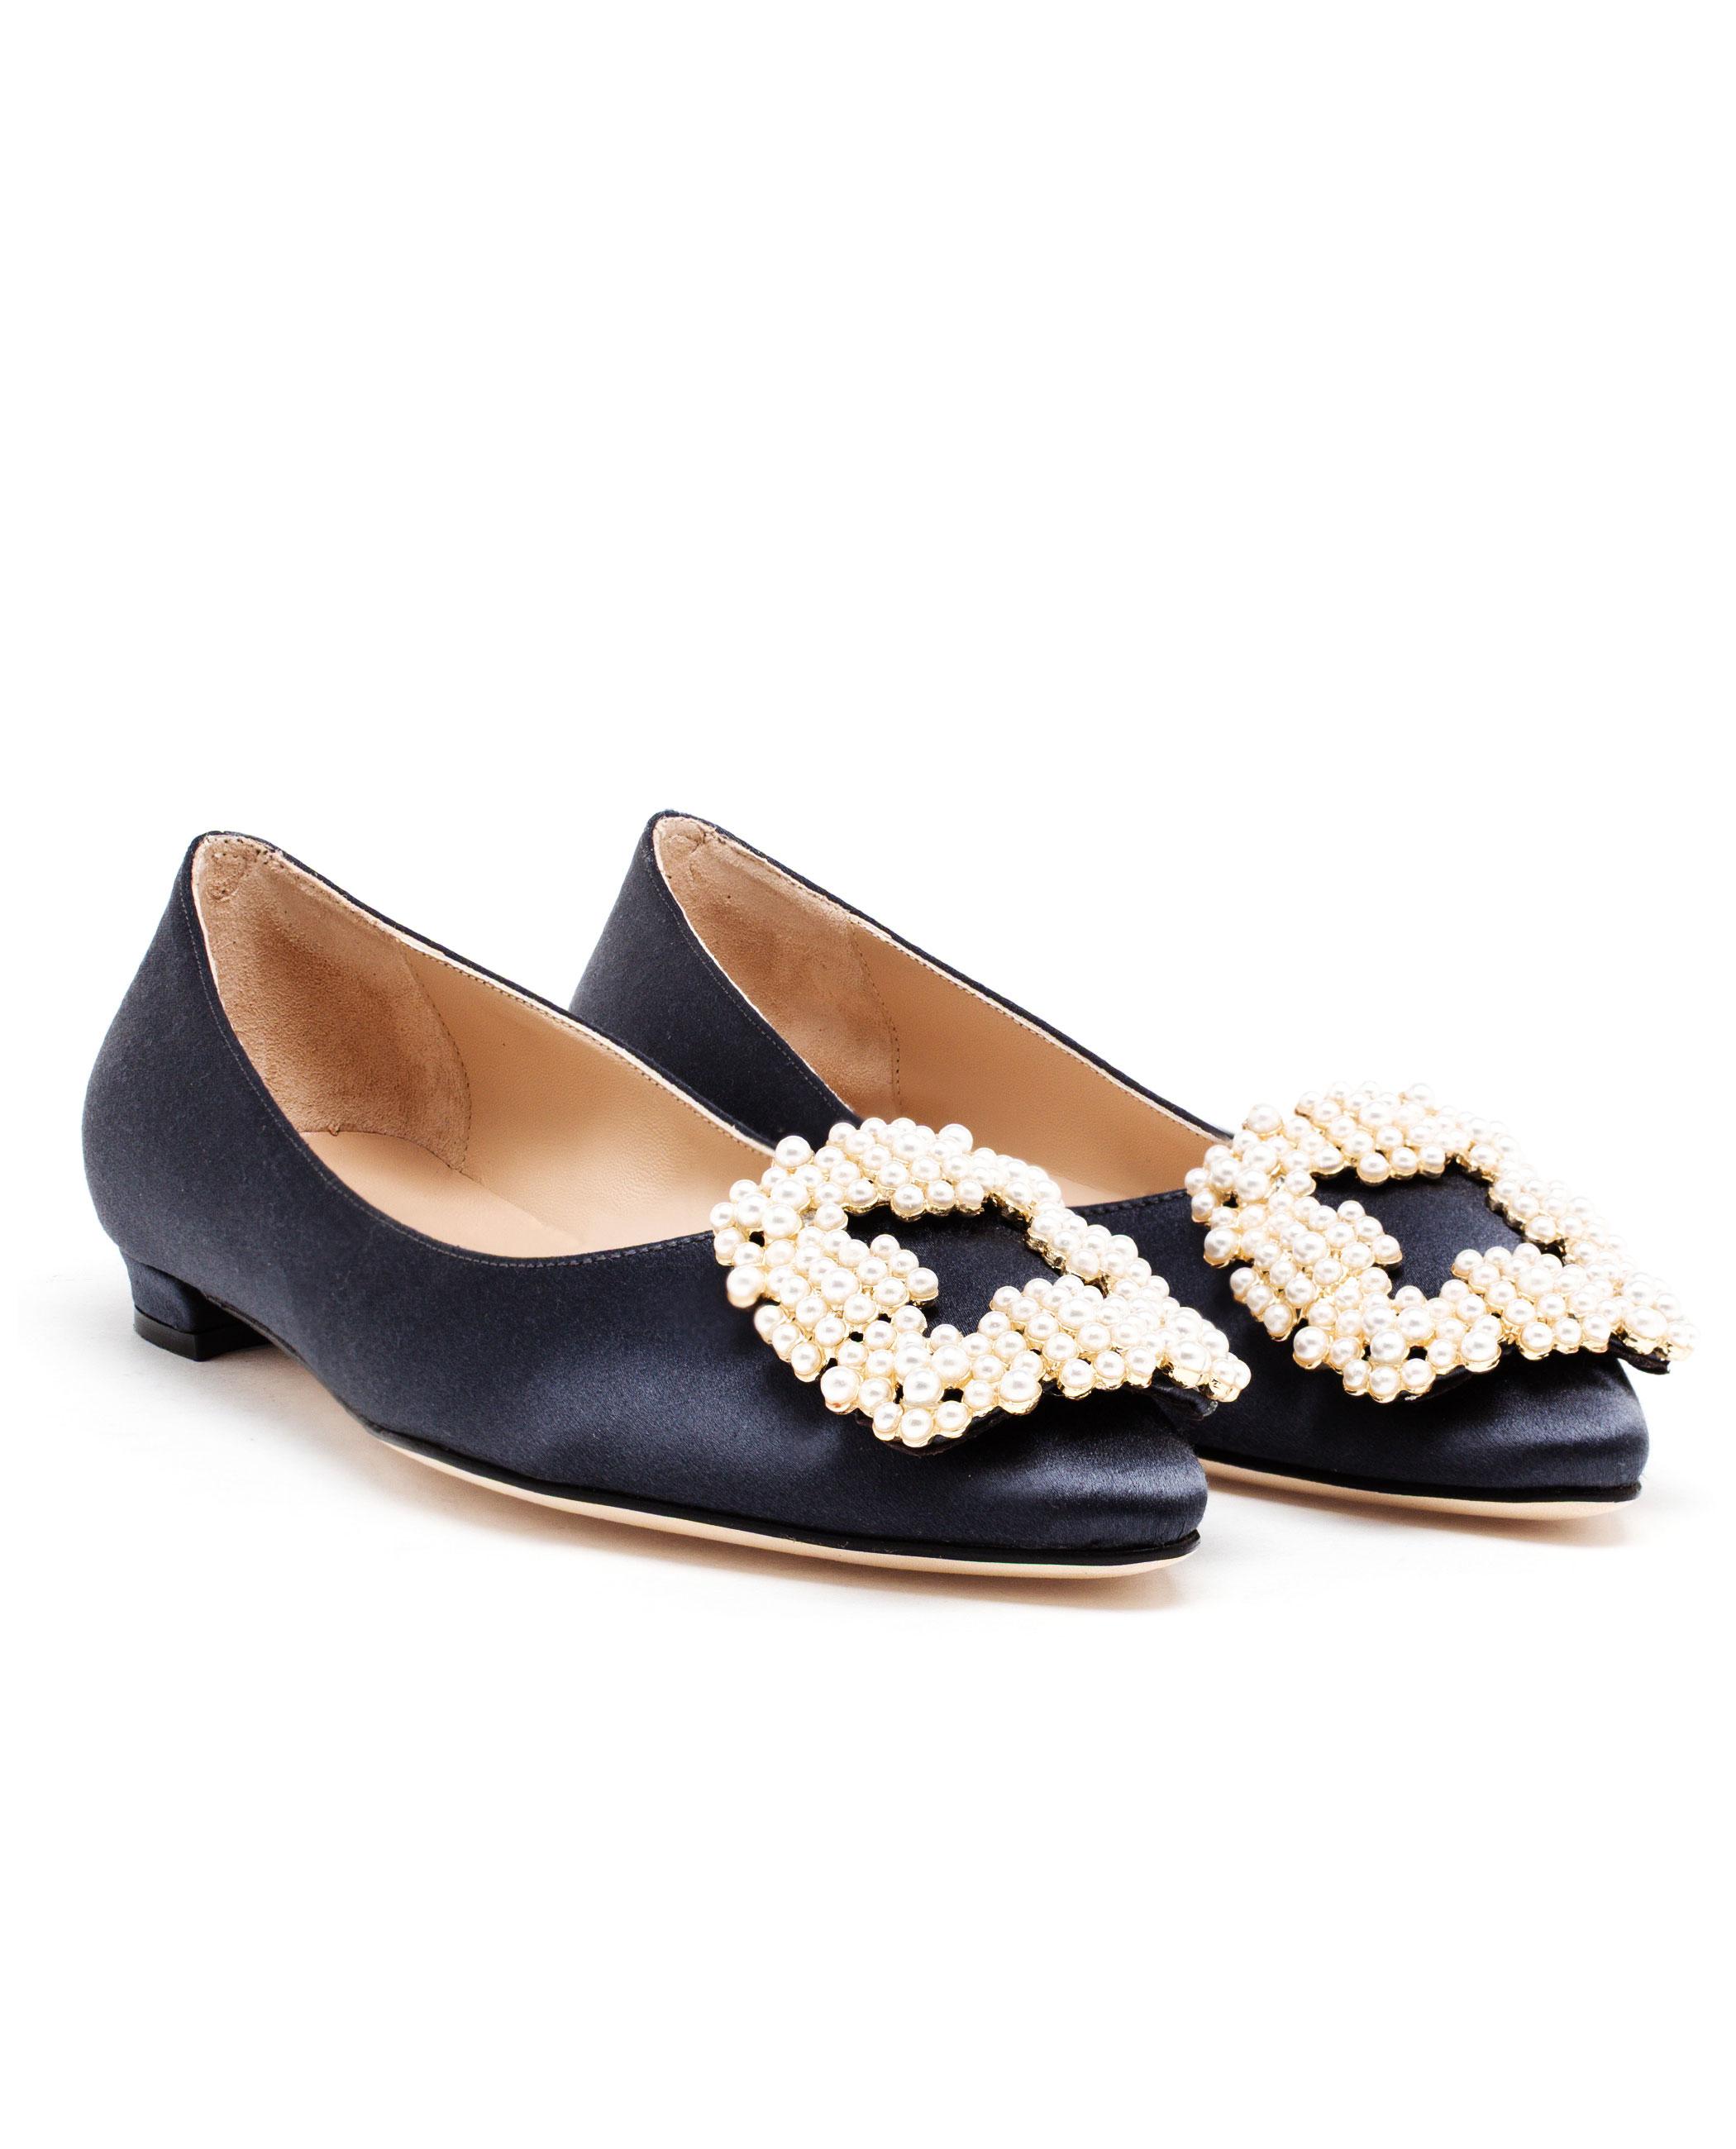 Grey Satin Shoes Size